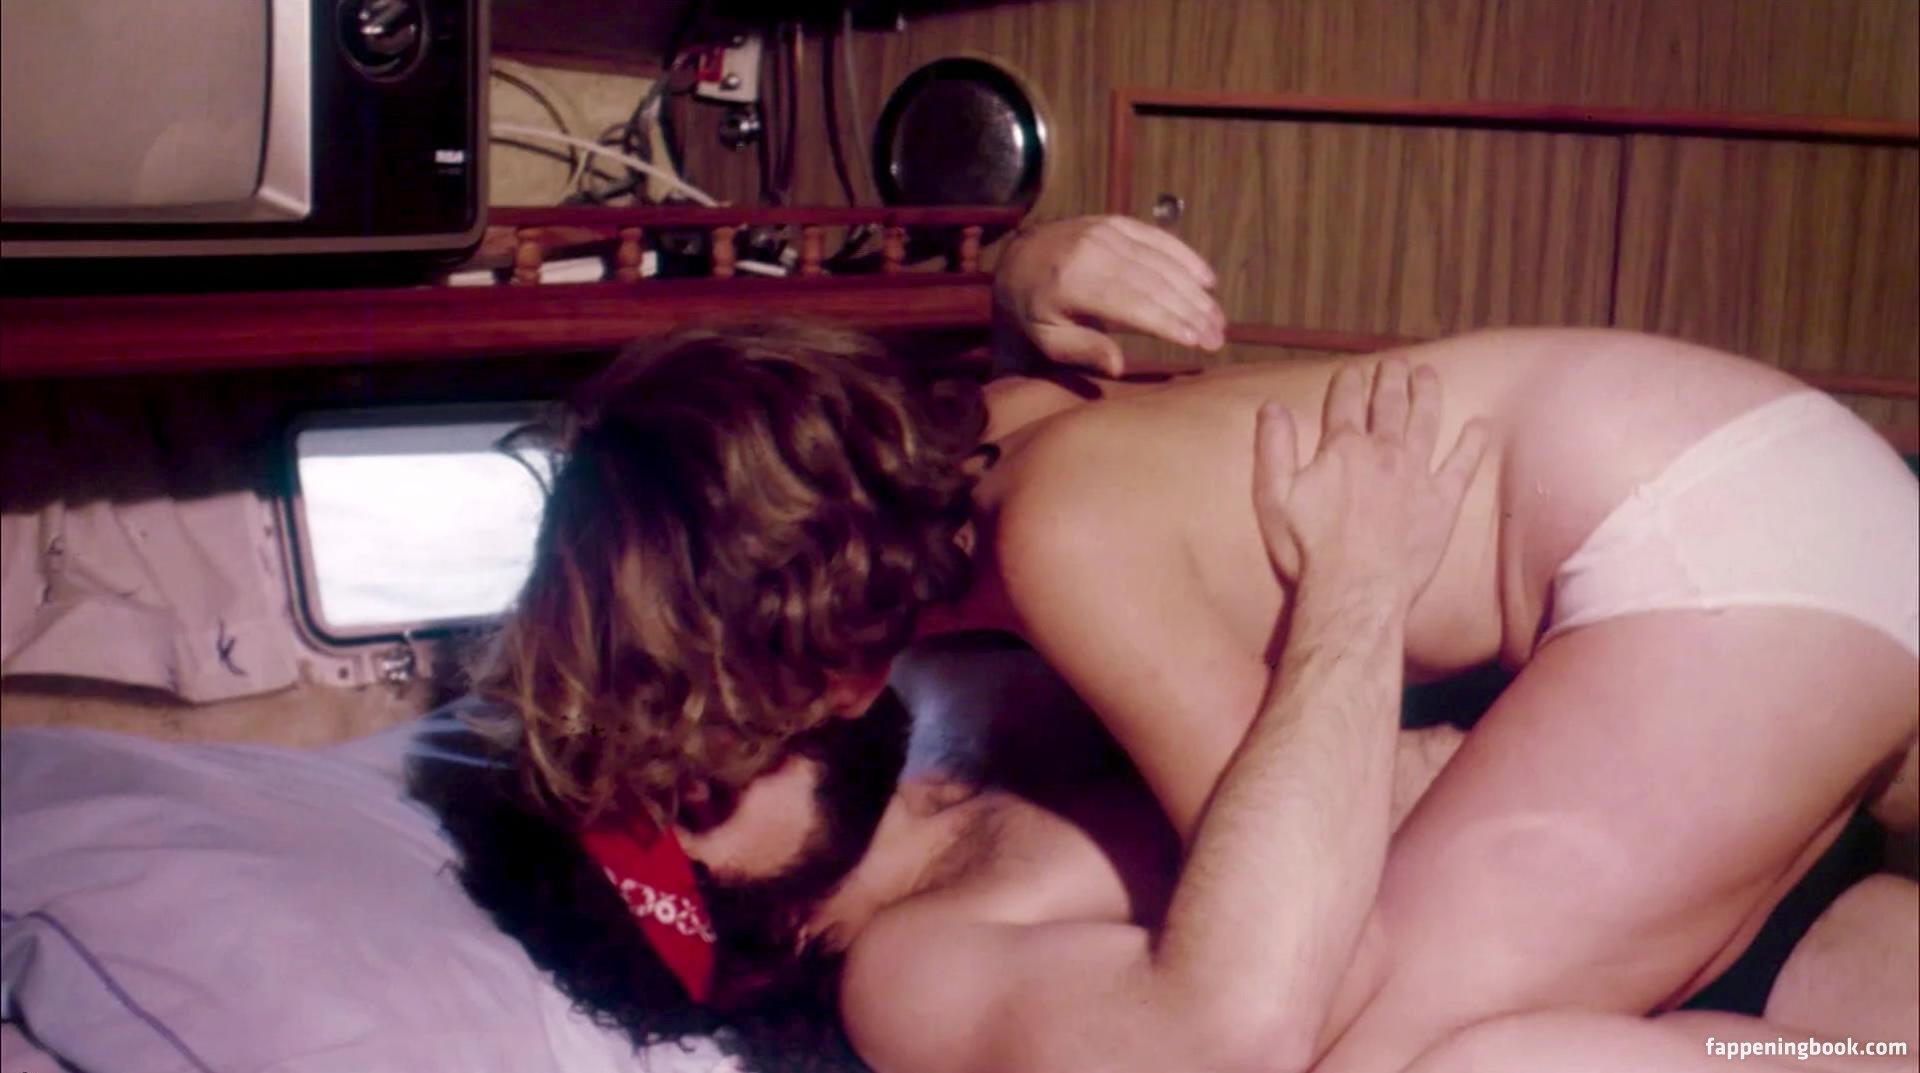 Sharon Smith Nude